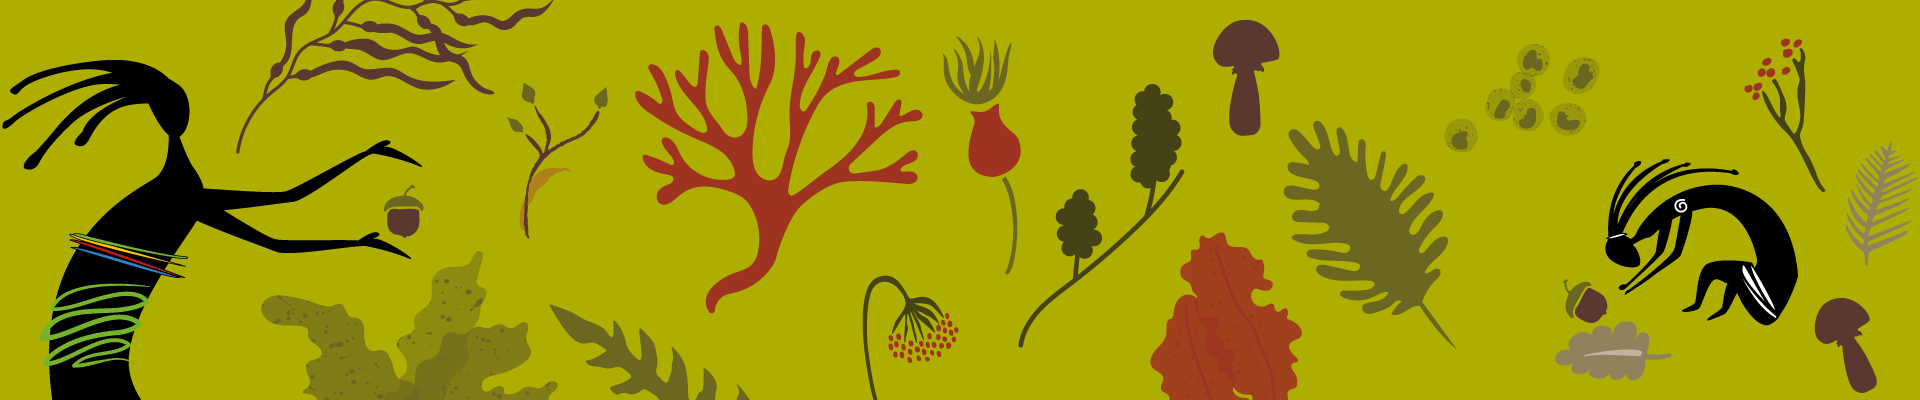 10 Reasons to start foraging